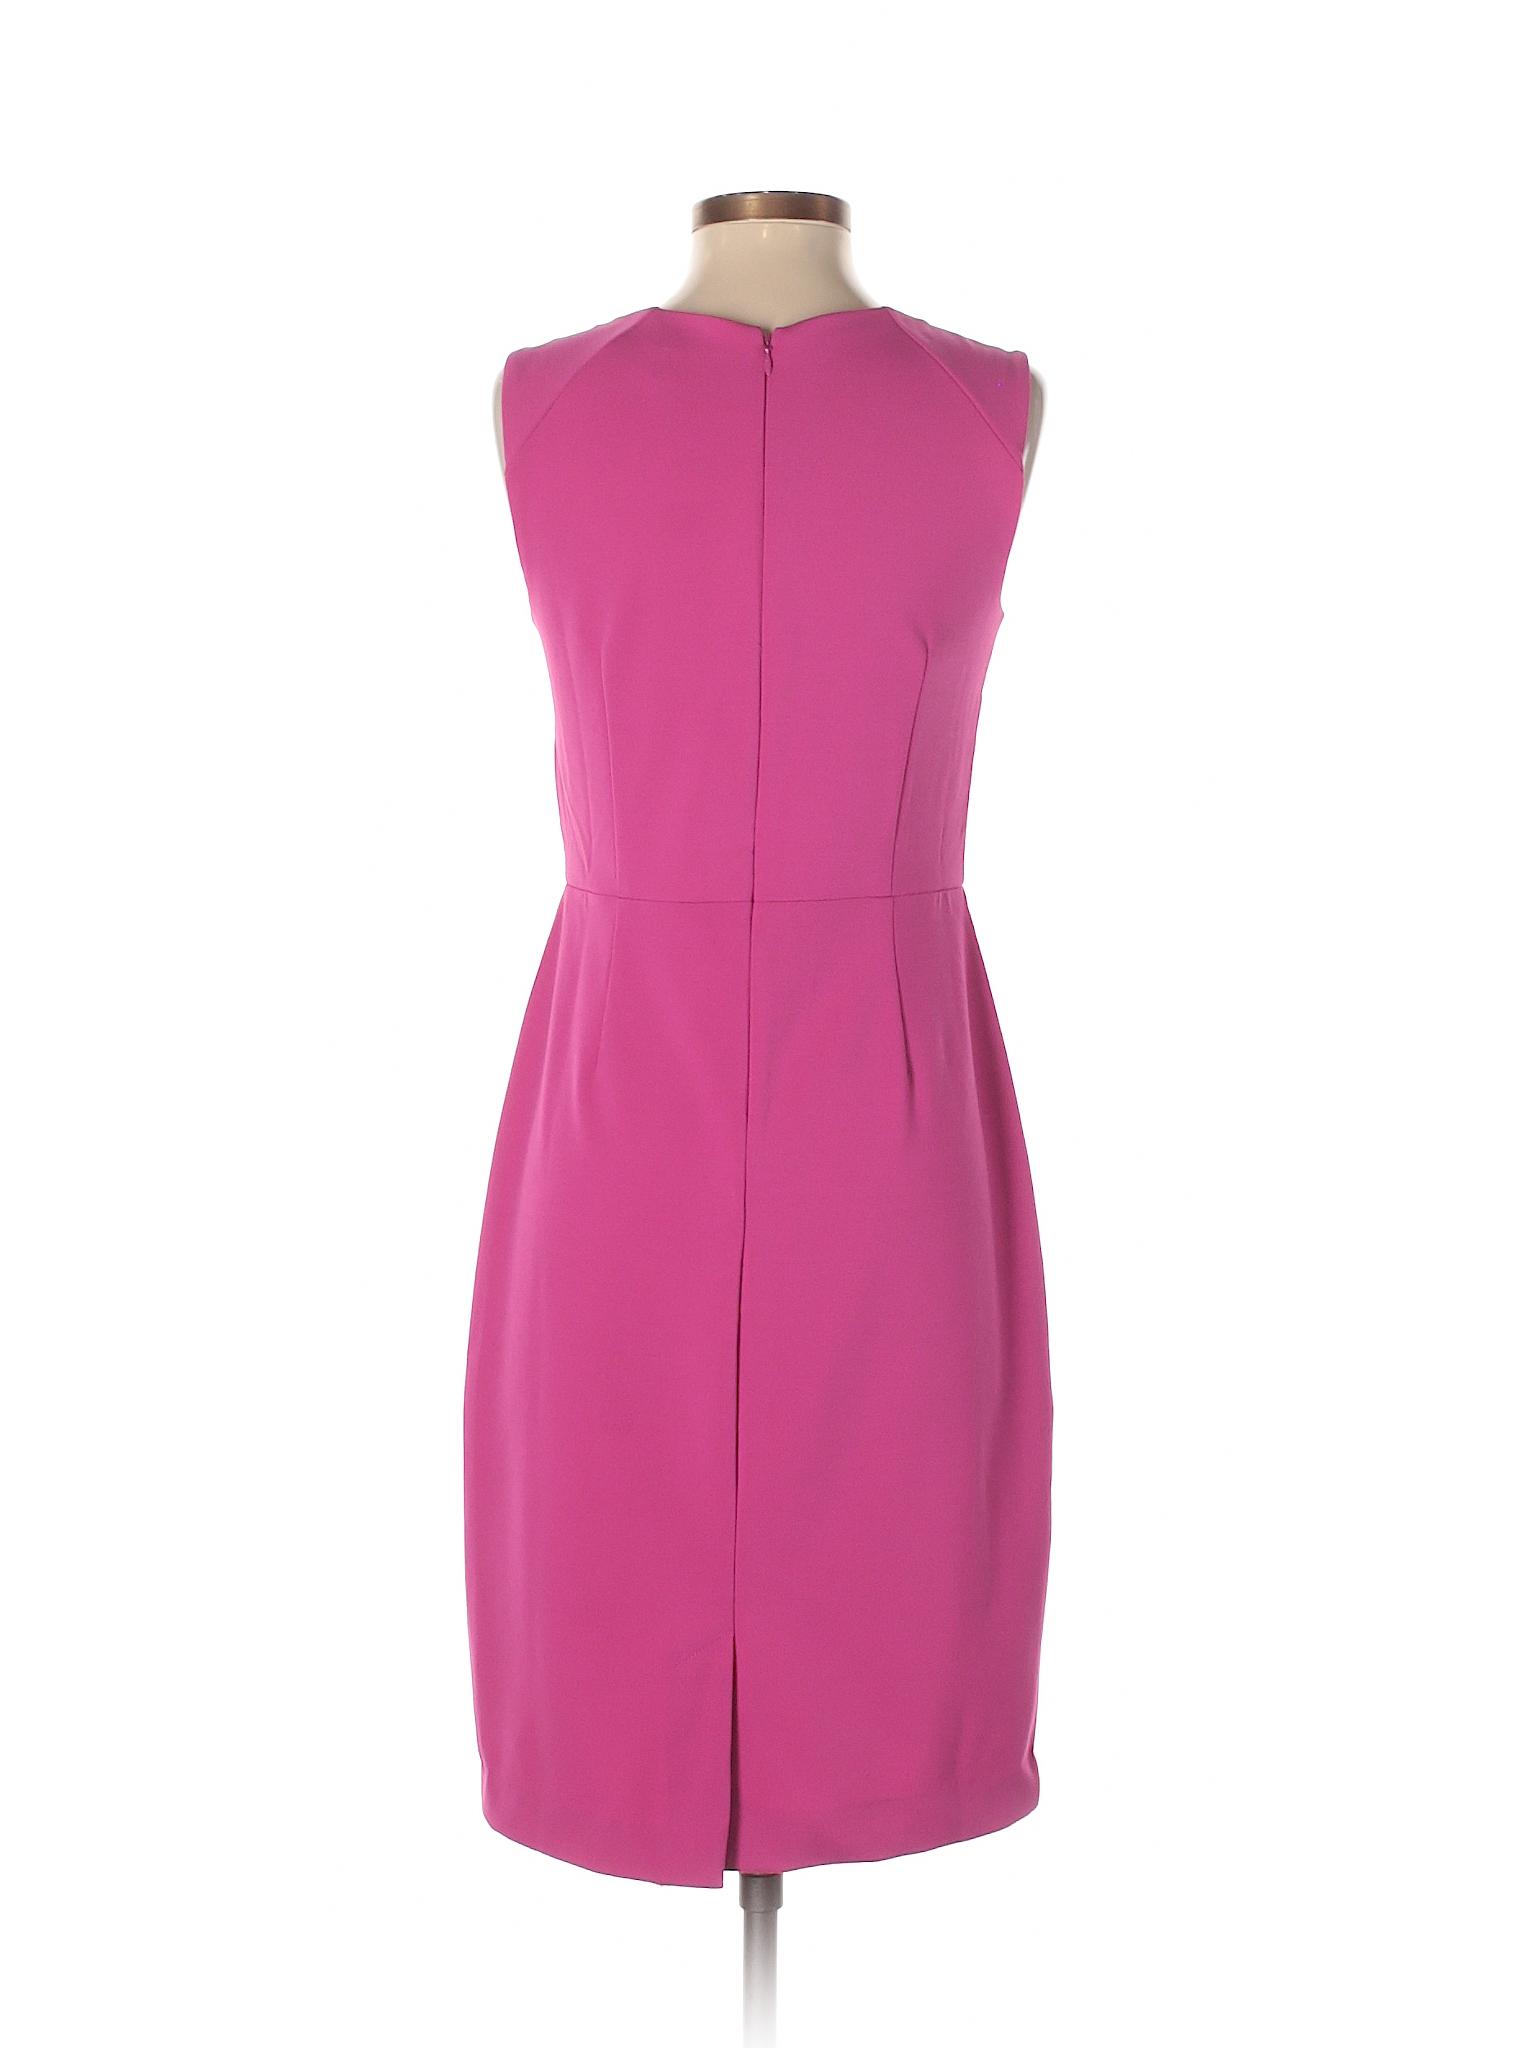 Republic Banana winter Boutique Store Factory Dress Casual OHgpx7wq